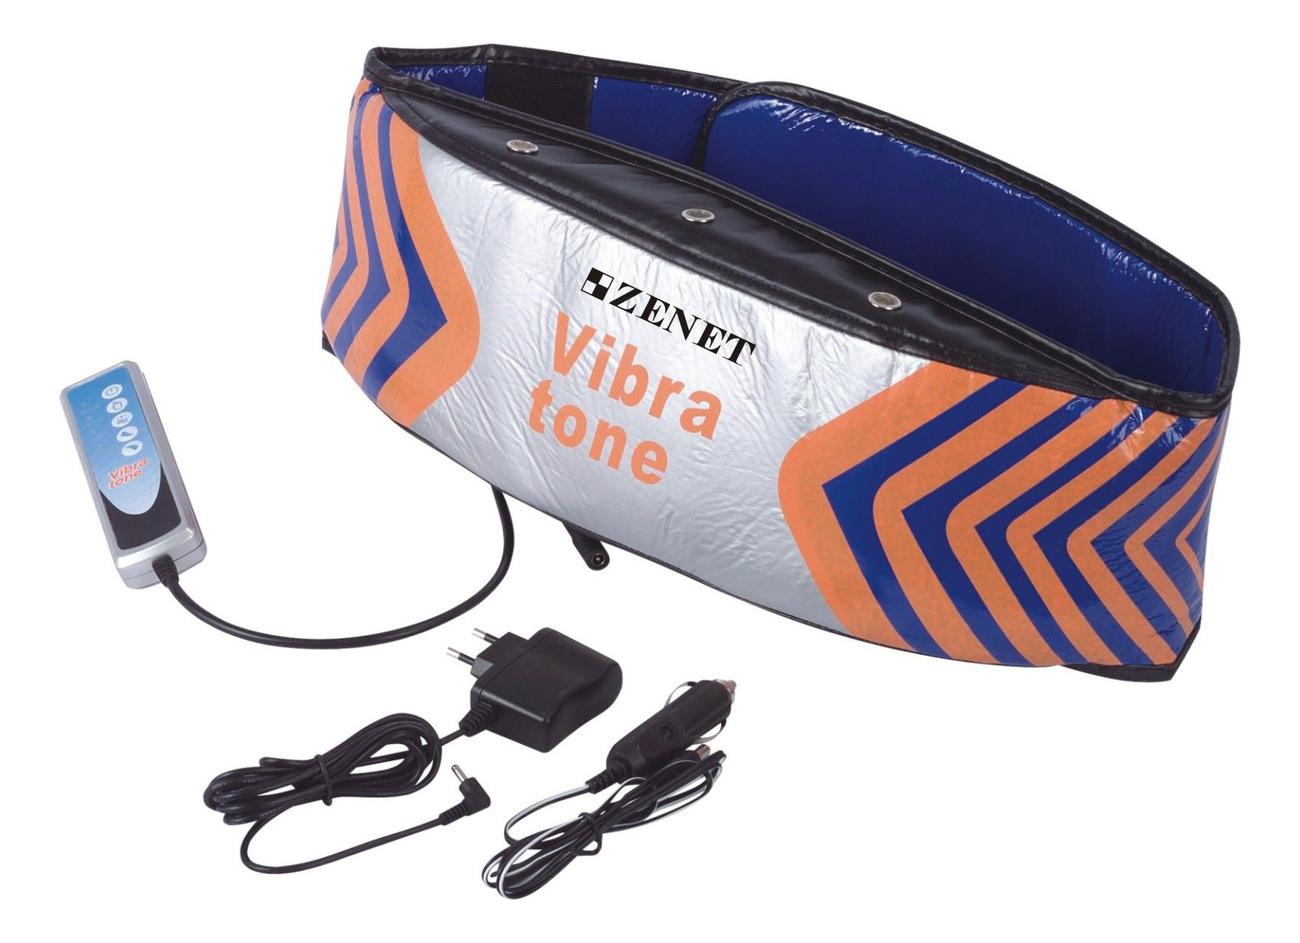 Массажный пояс для похудения ZET-752 пояс для похудения sport elite rj1001